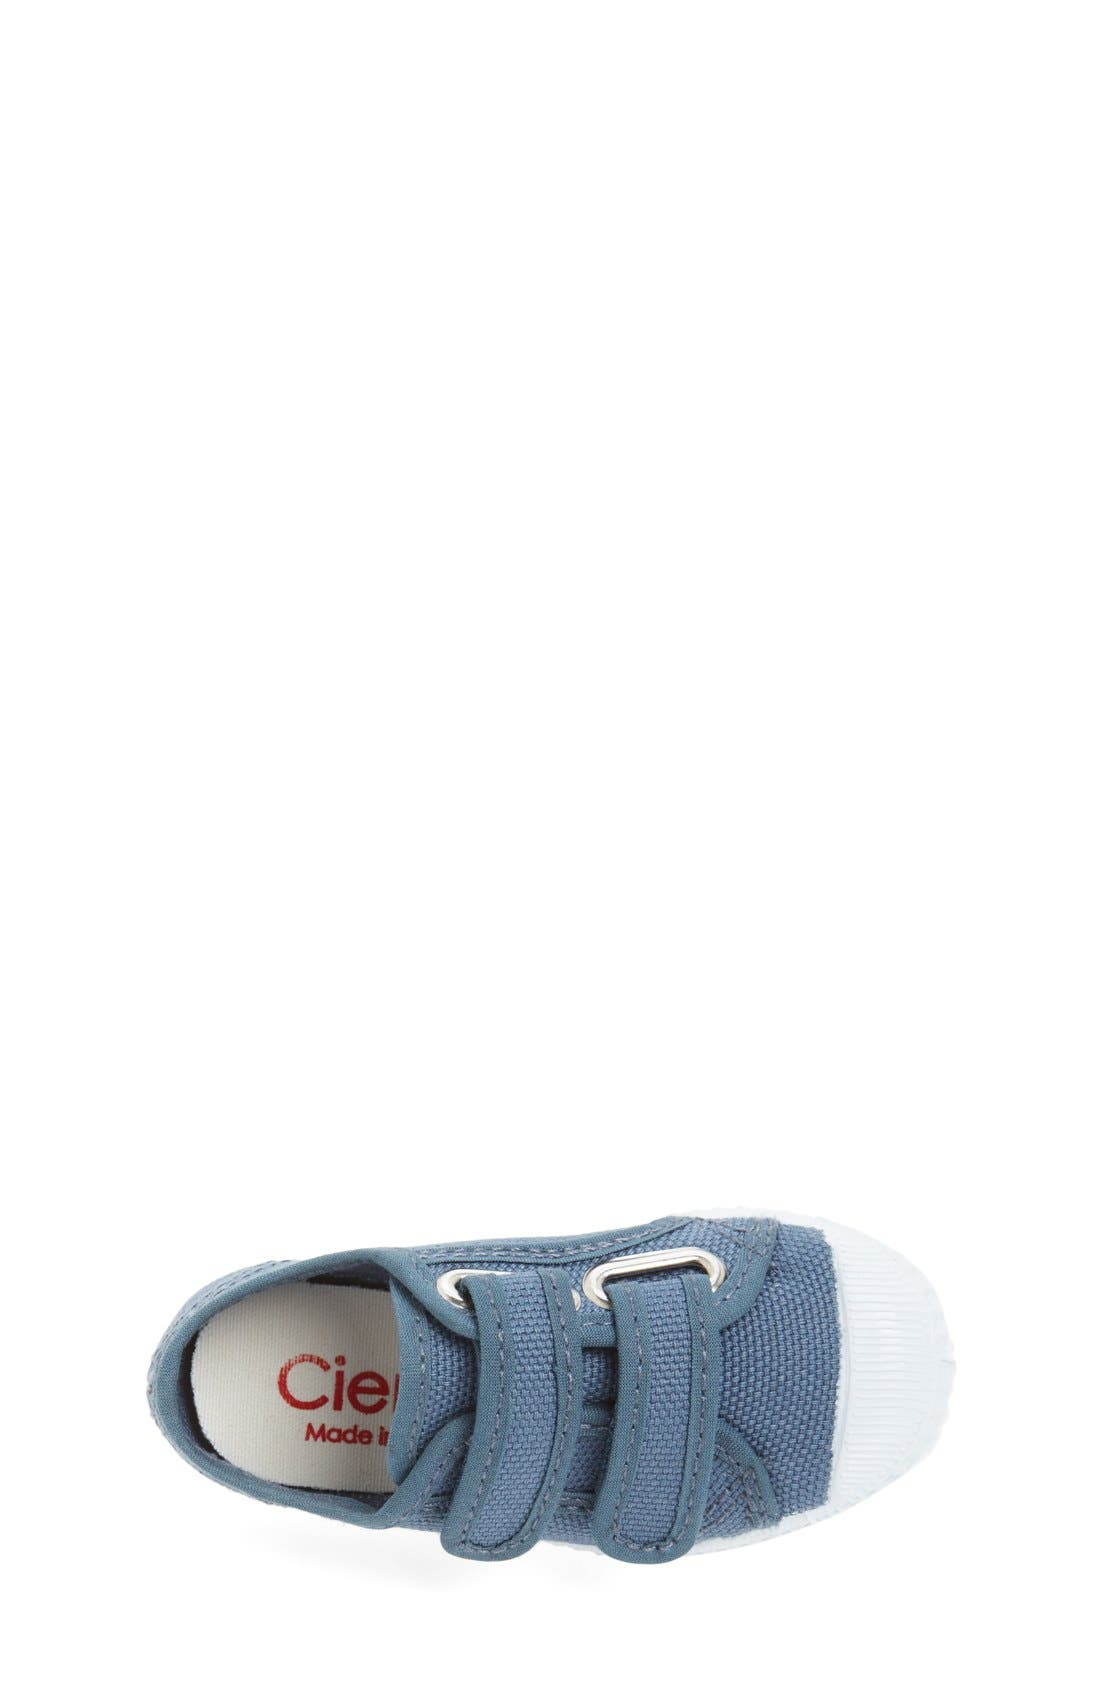 Canvas Sneaker,                             Alternate thumbnail 3, color,                             Grey